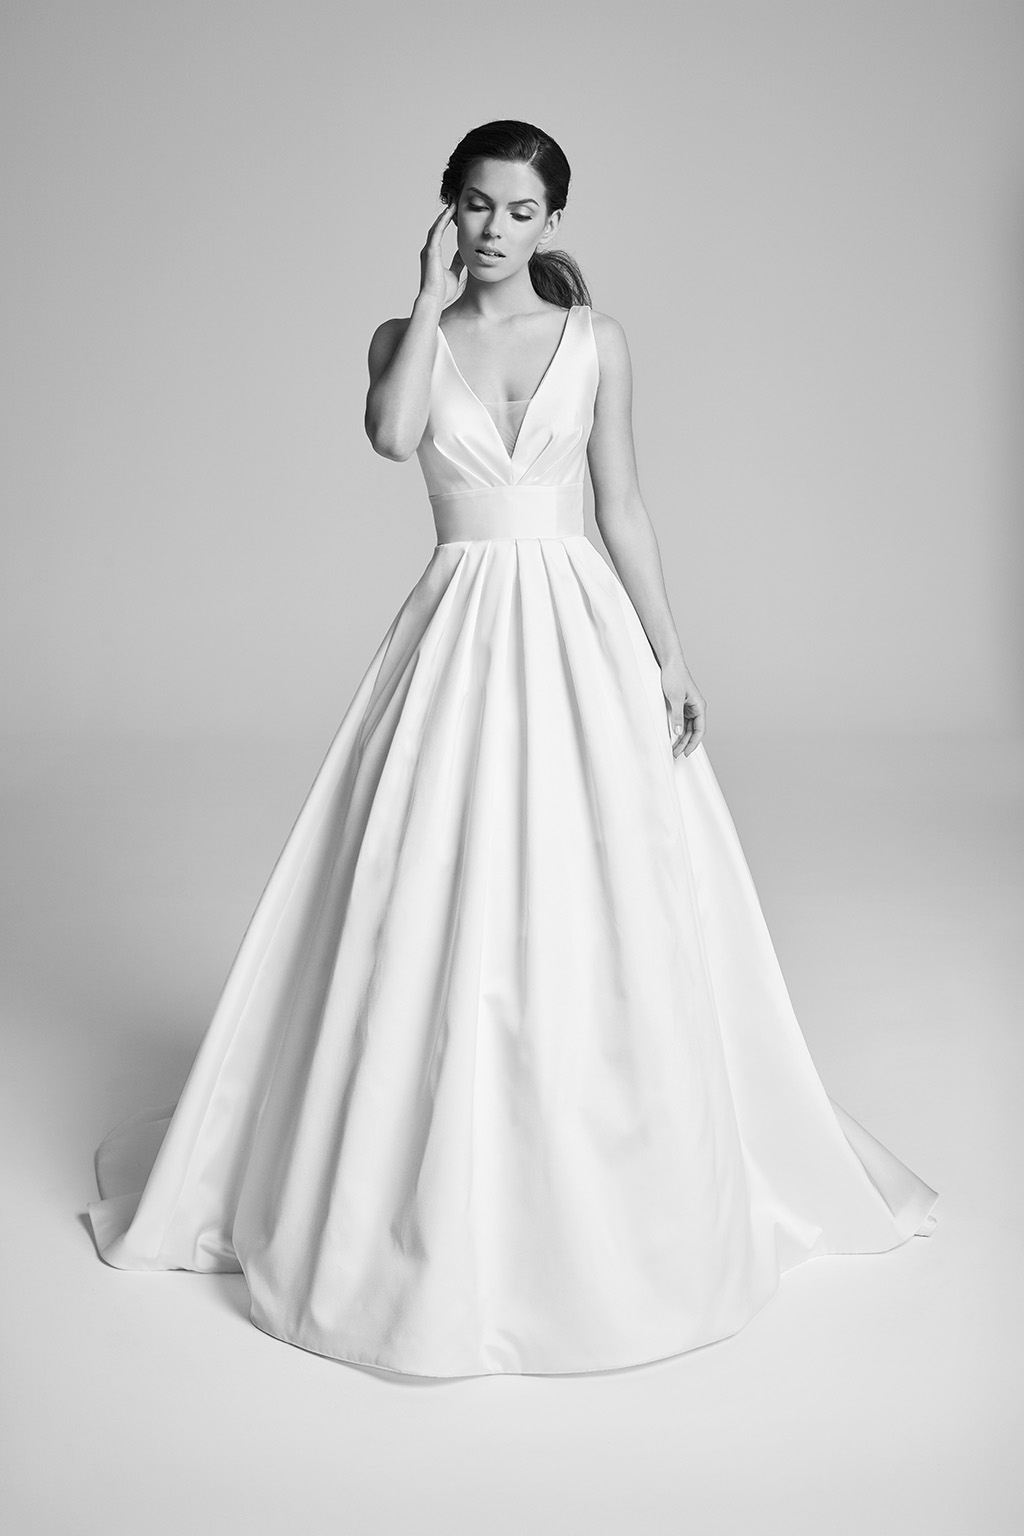 corbel-bridalcouture-wedding-dresses-uk-belle-epoque-collection-2018-by-designer-suzanne-neville